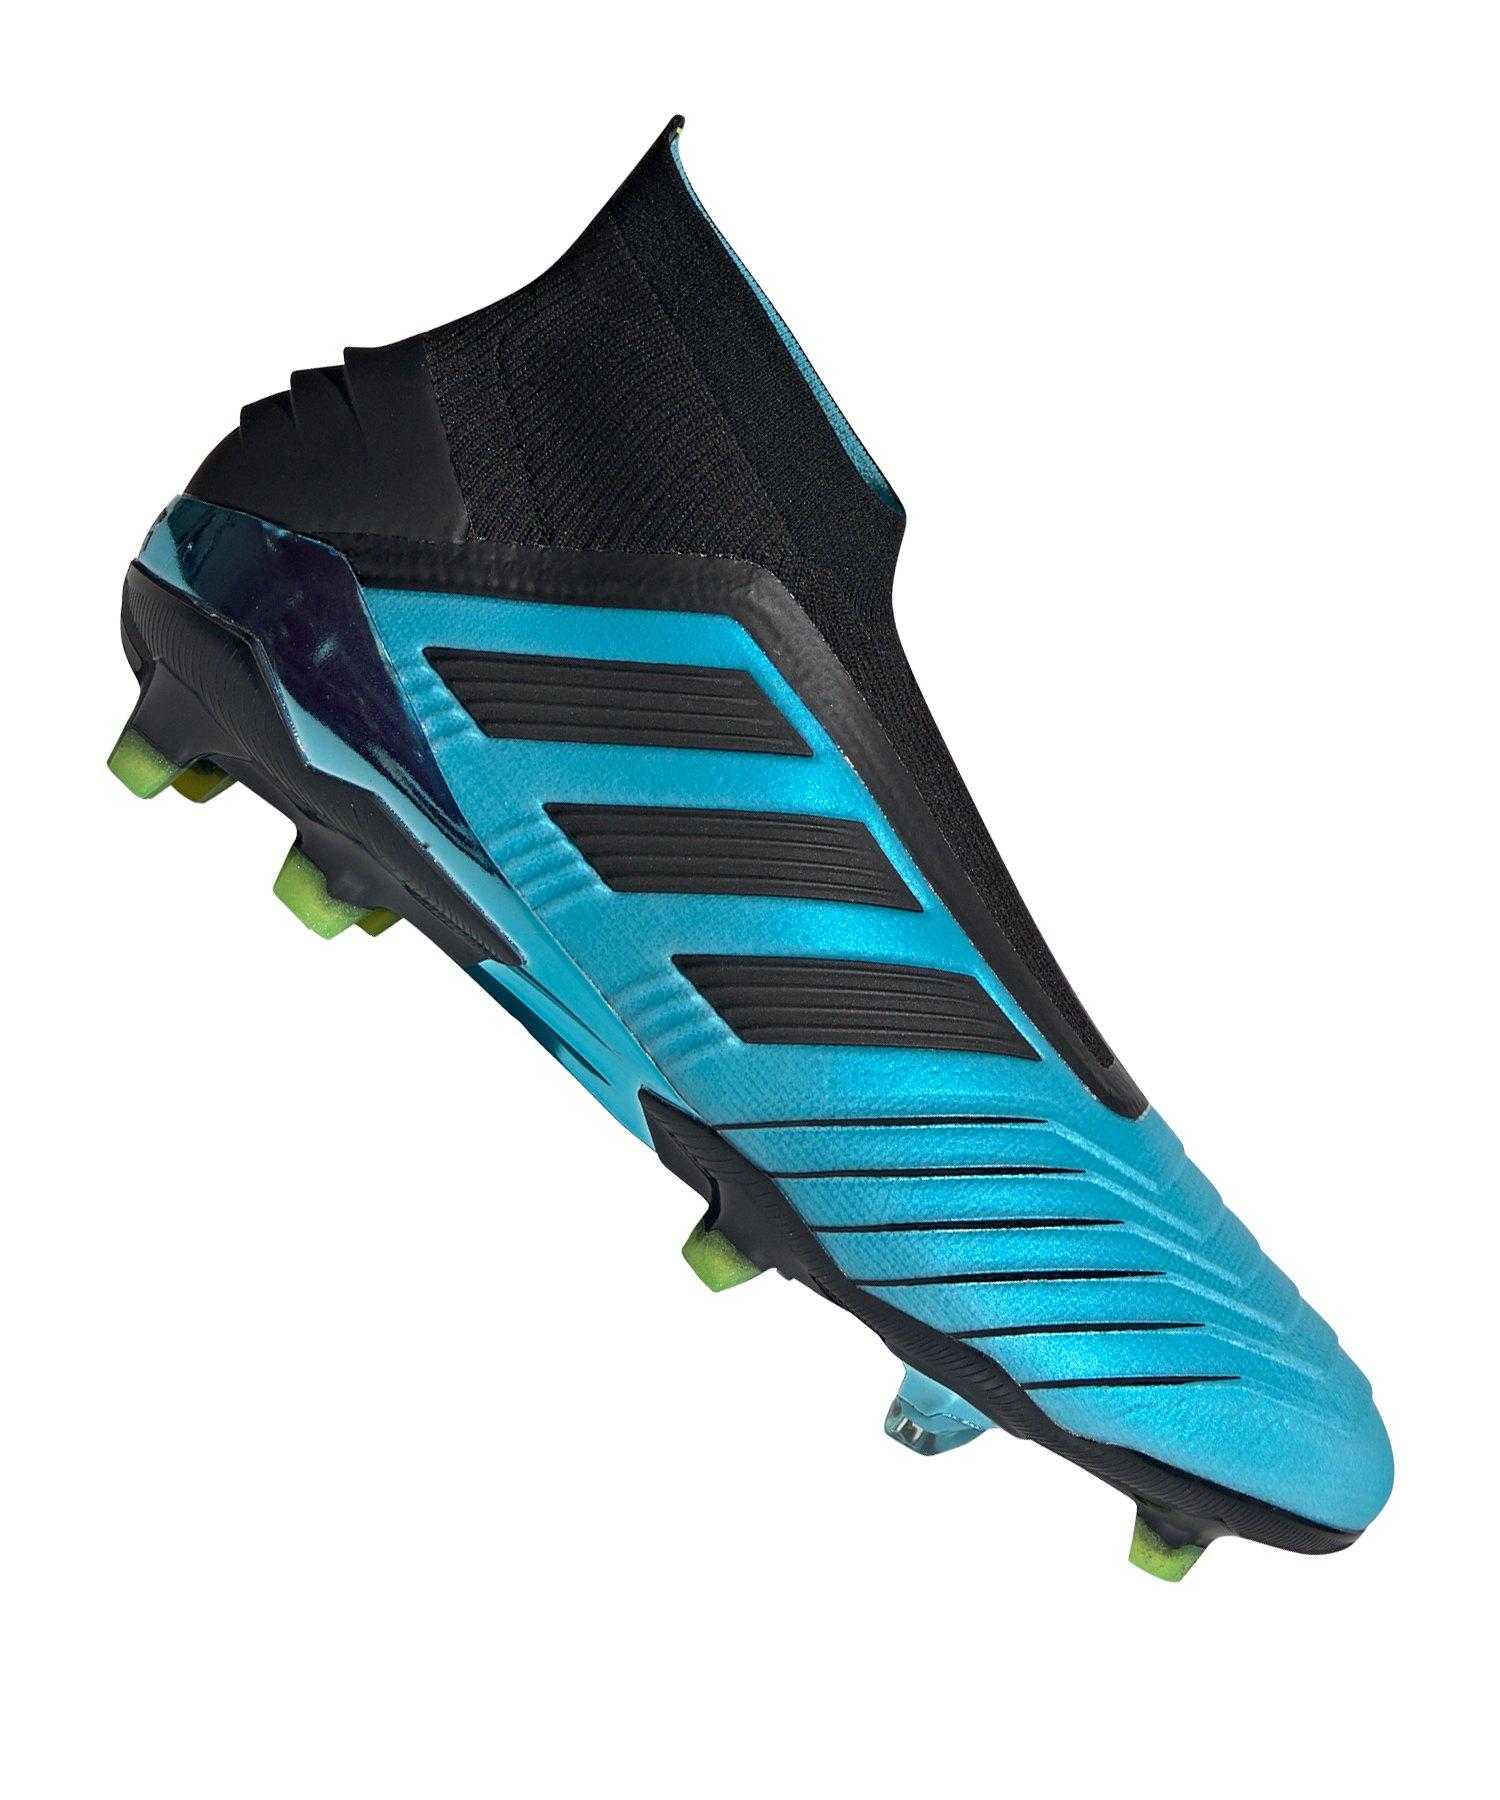 adidas predator 19+ blau